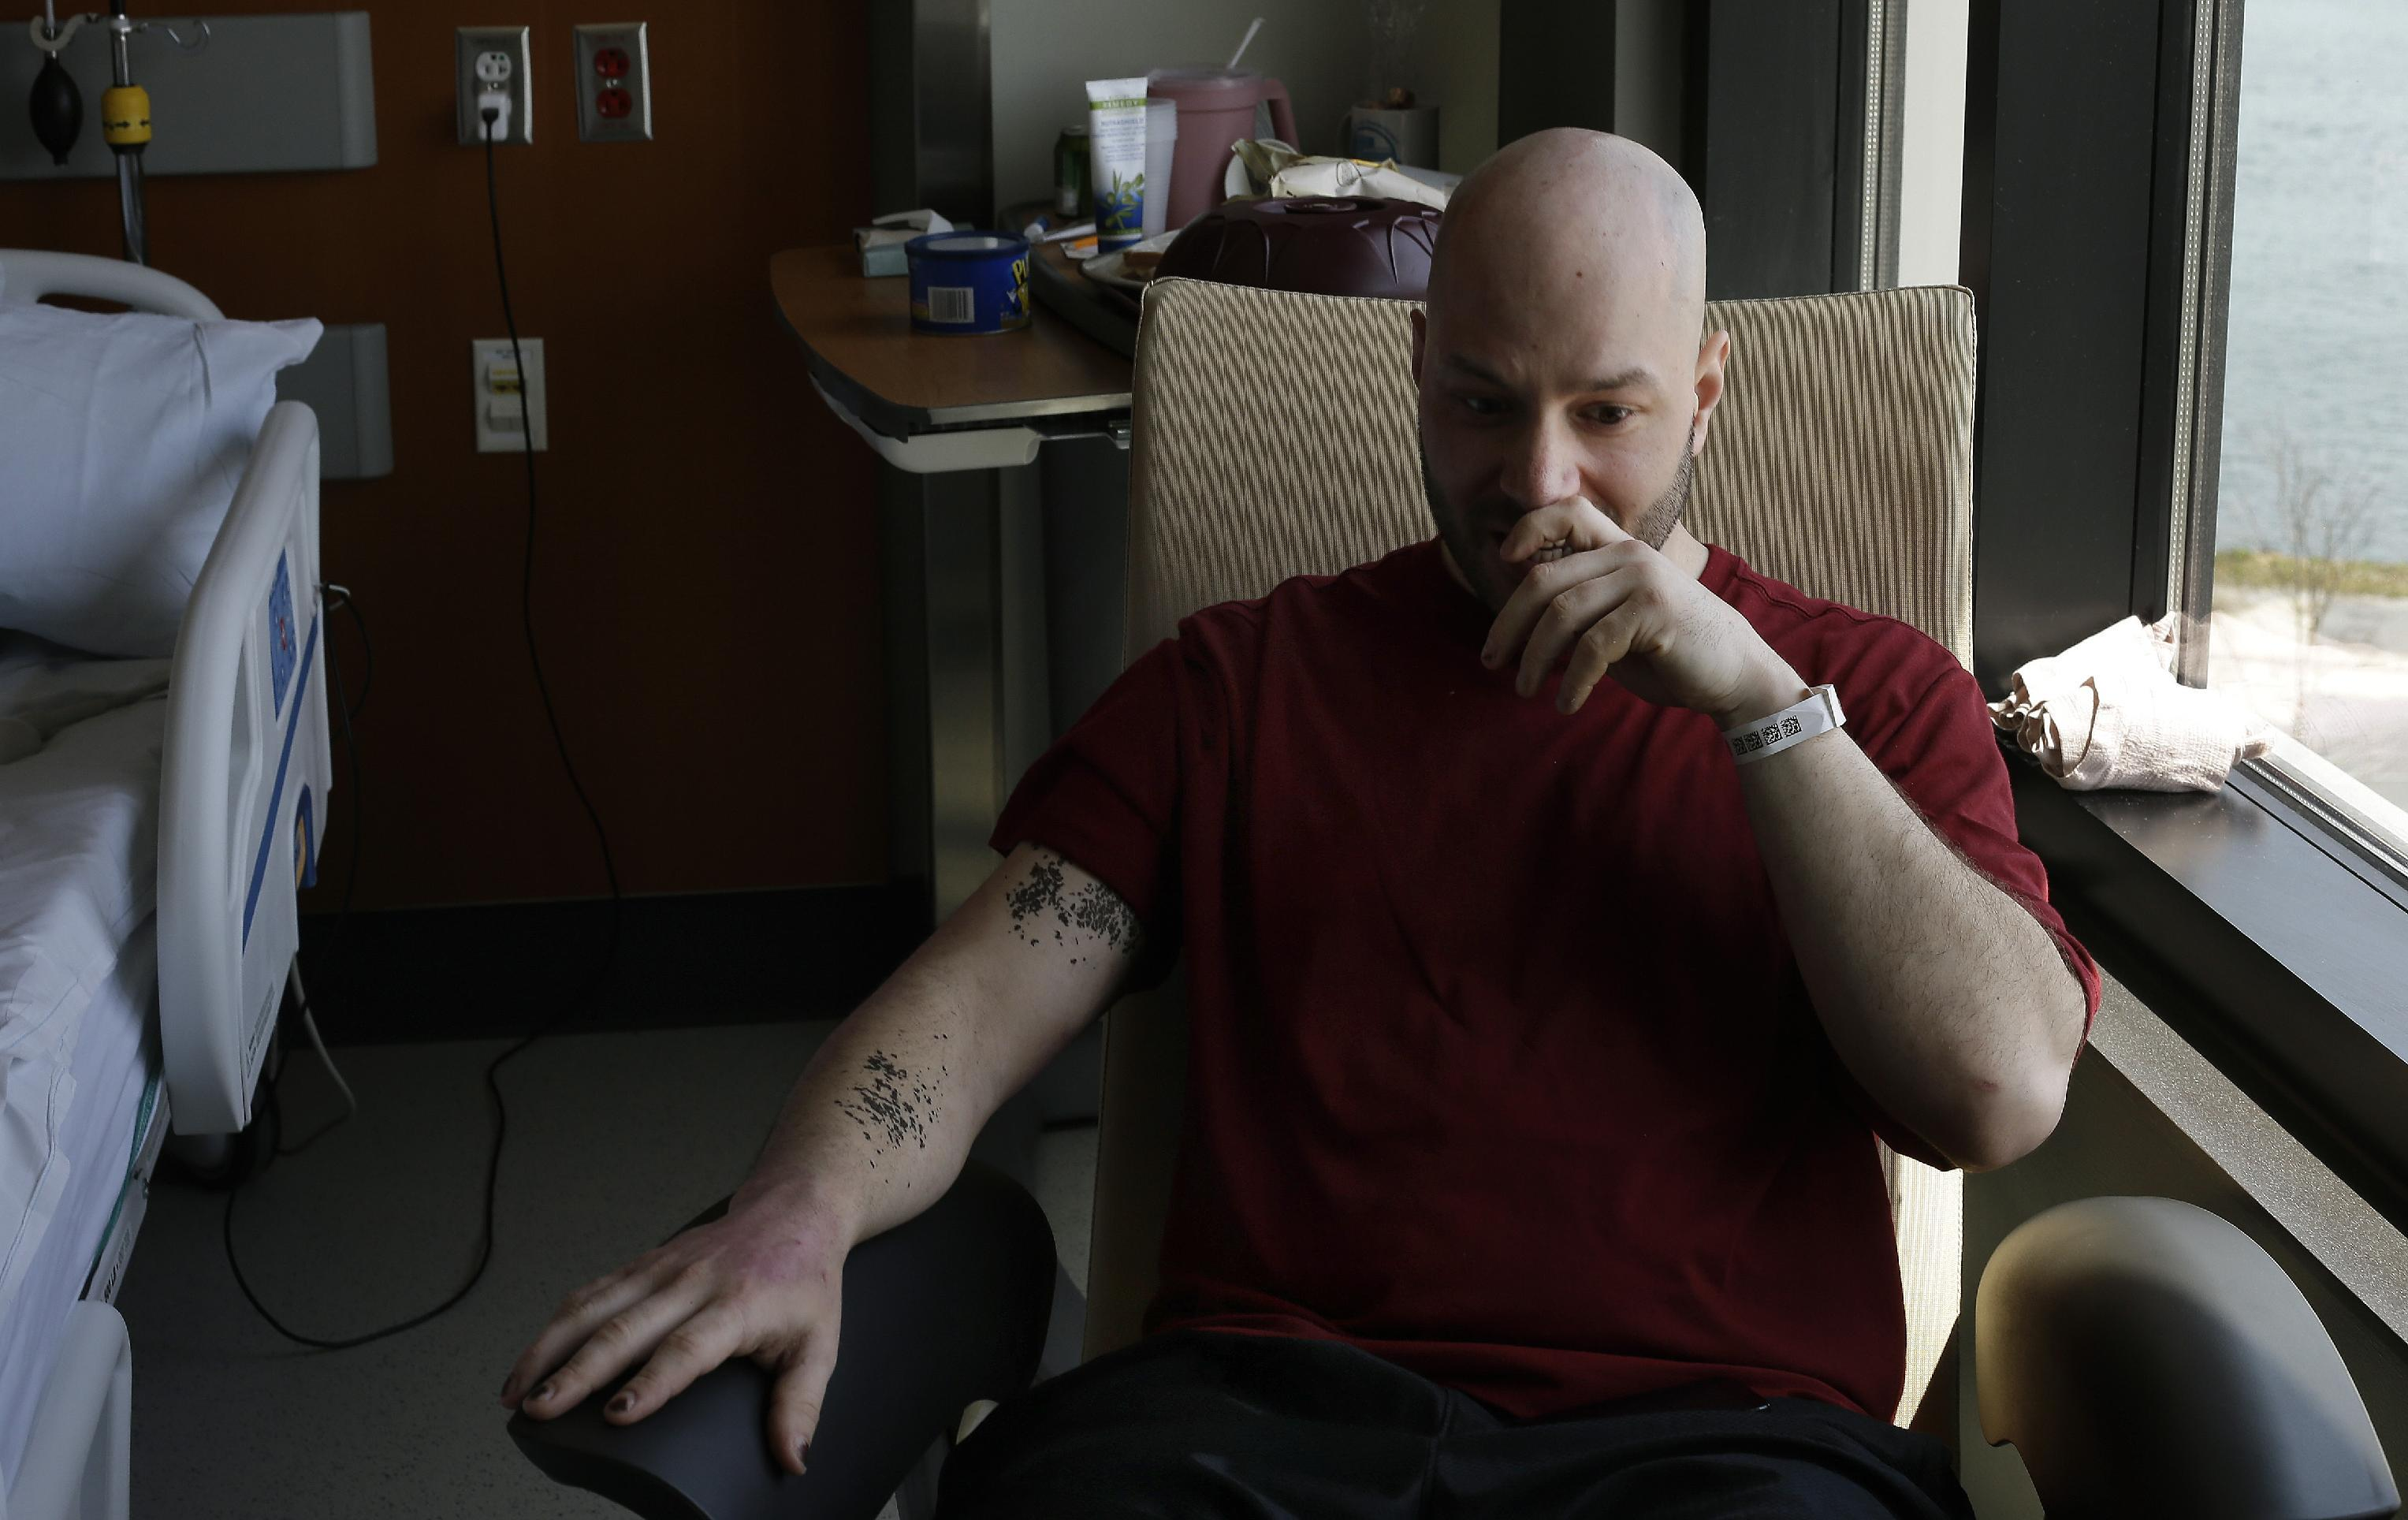 Marathon Bombing Survivor Wants Others Remembered